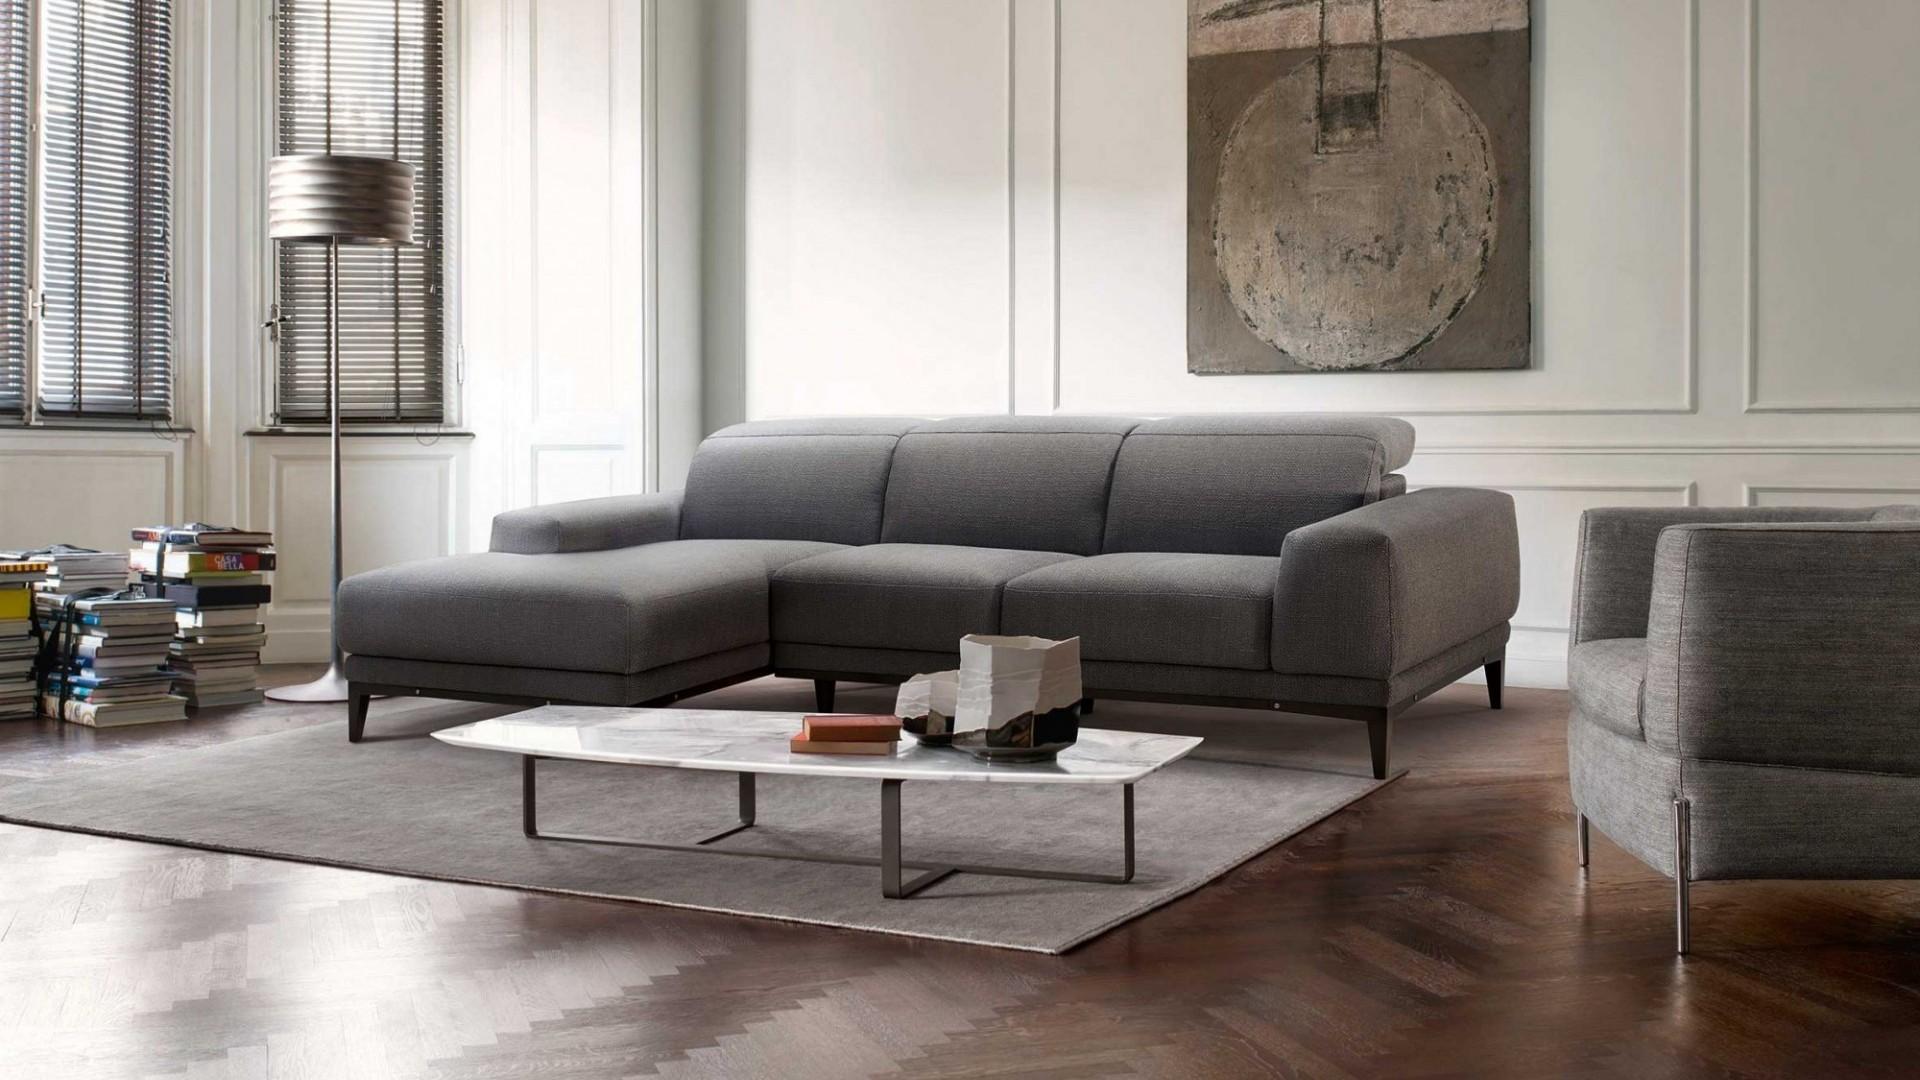 Borghese Sofas For Home Pinterest